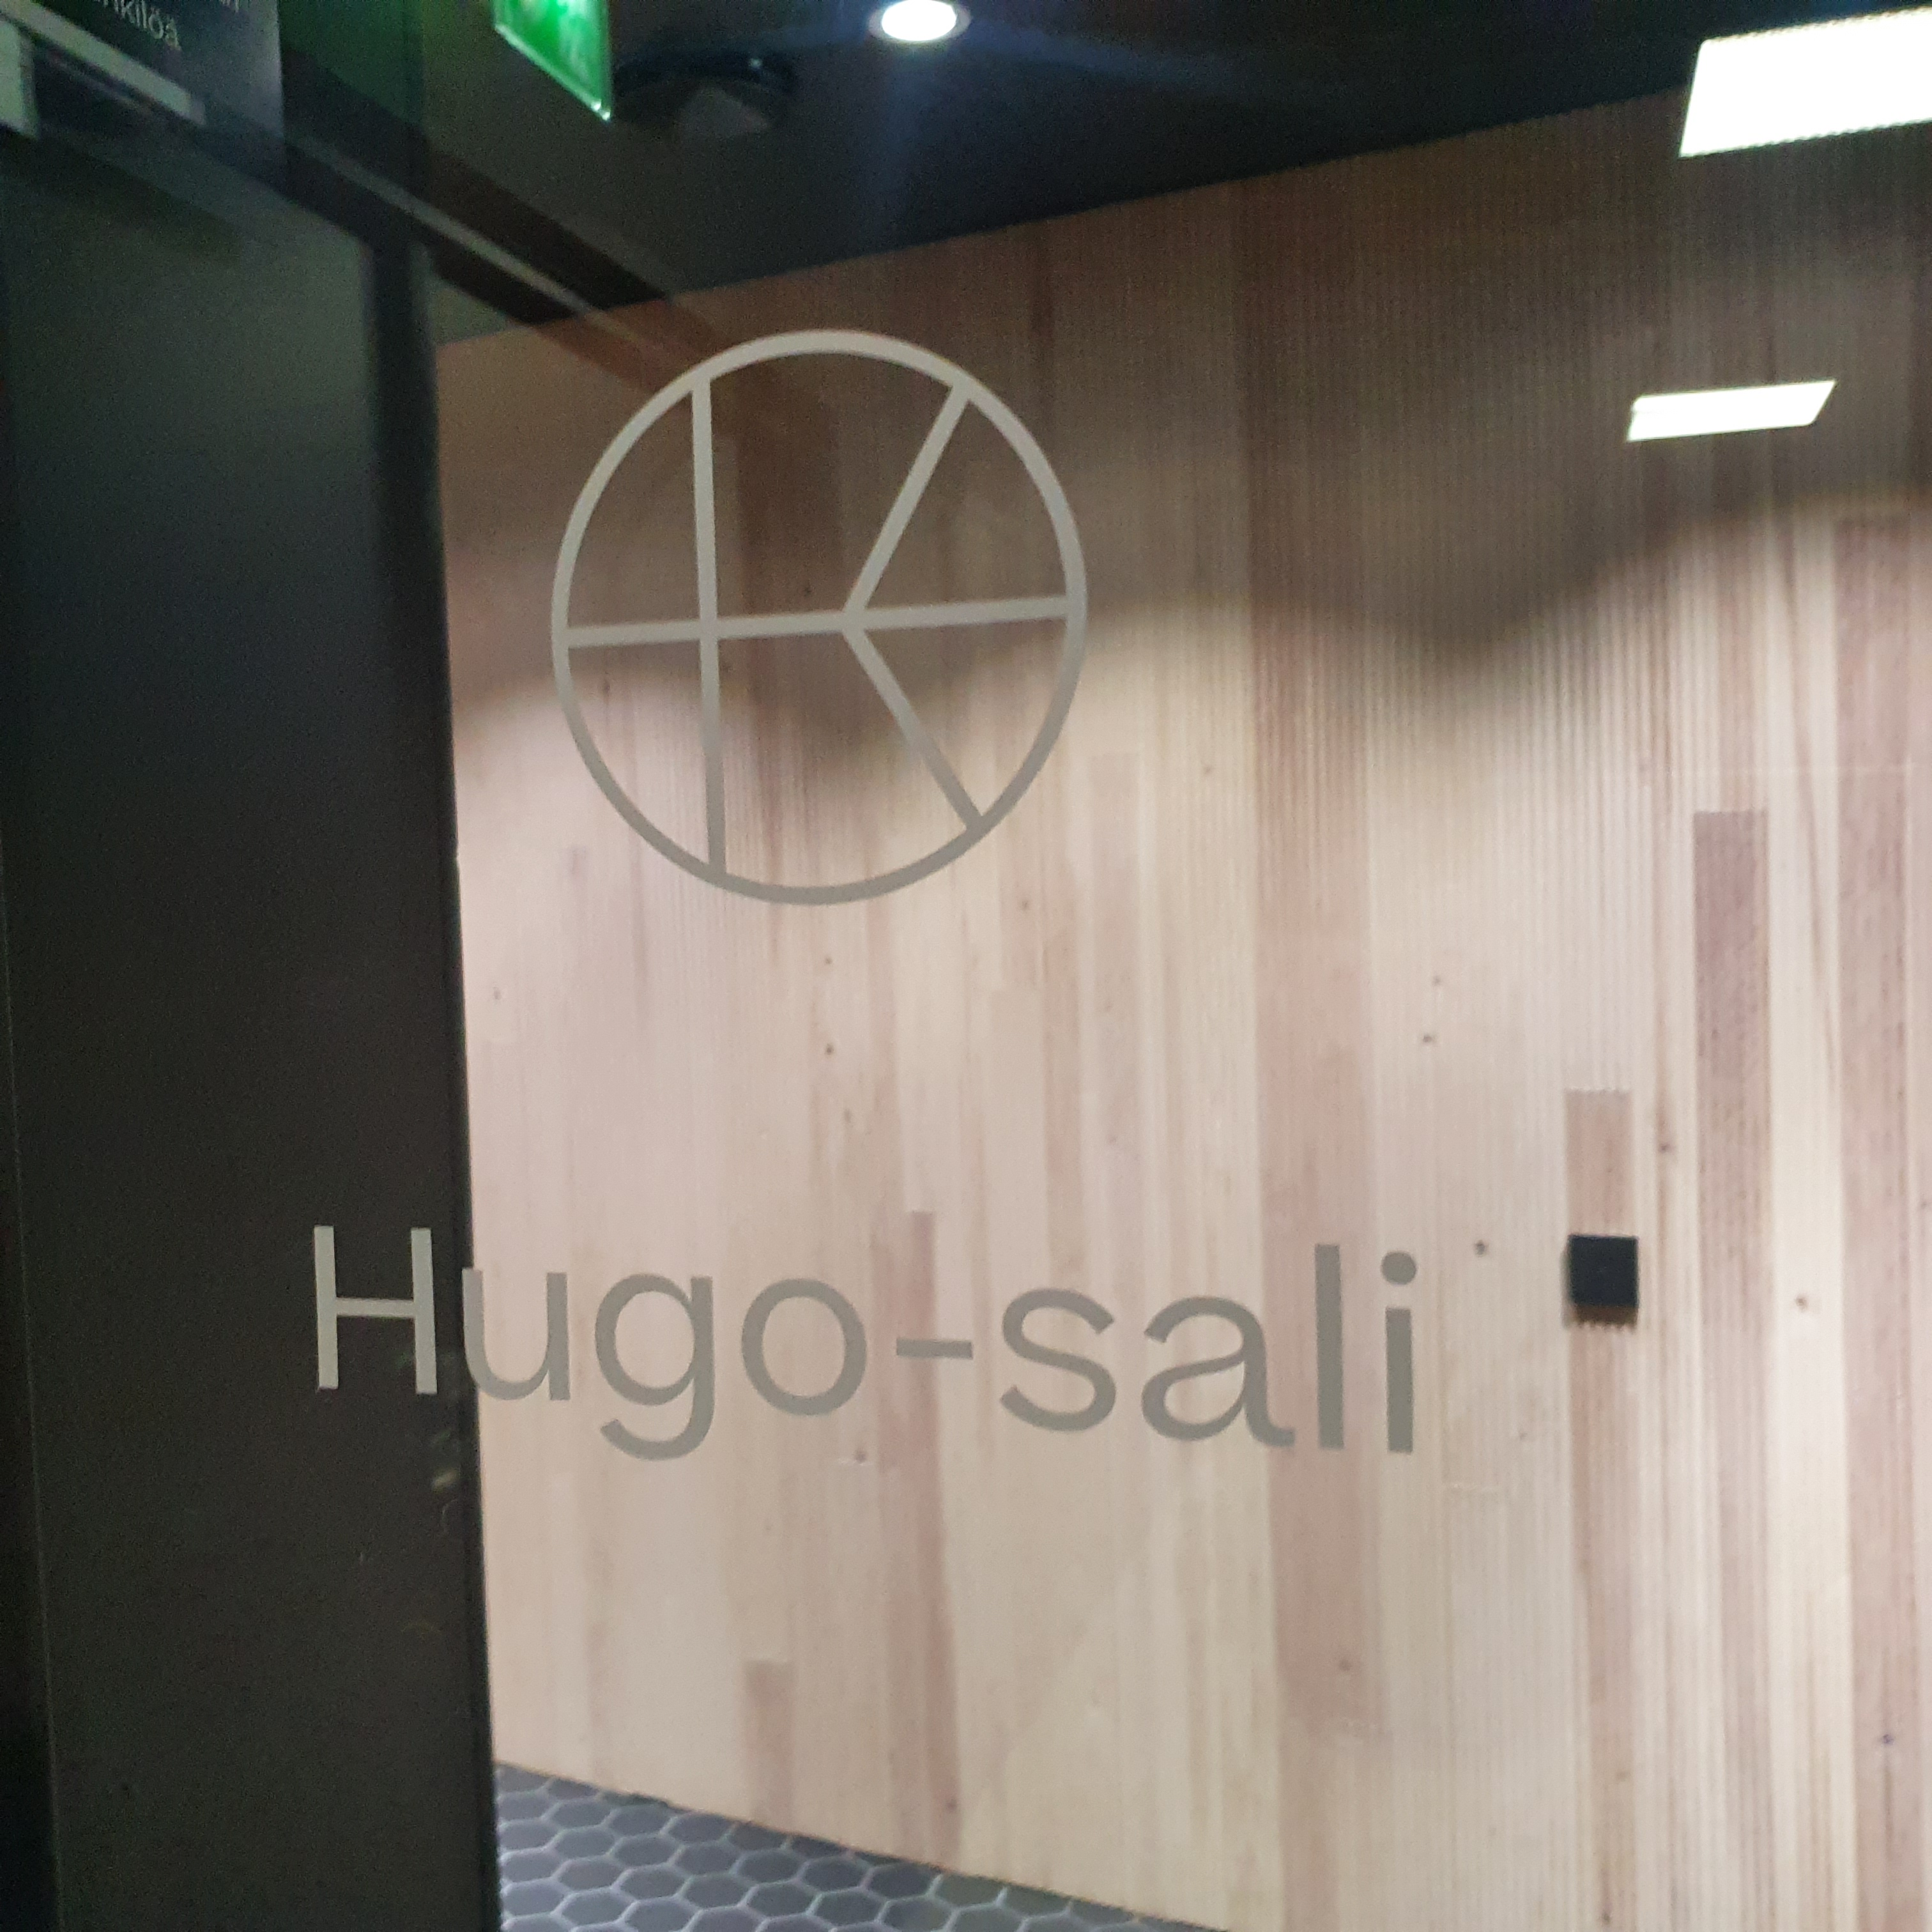 Glass door with a white logo reading Hugo sali